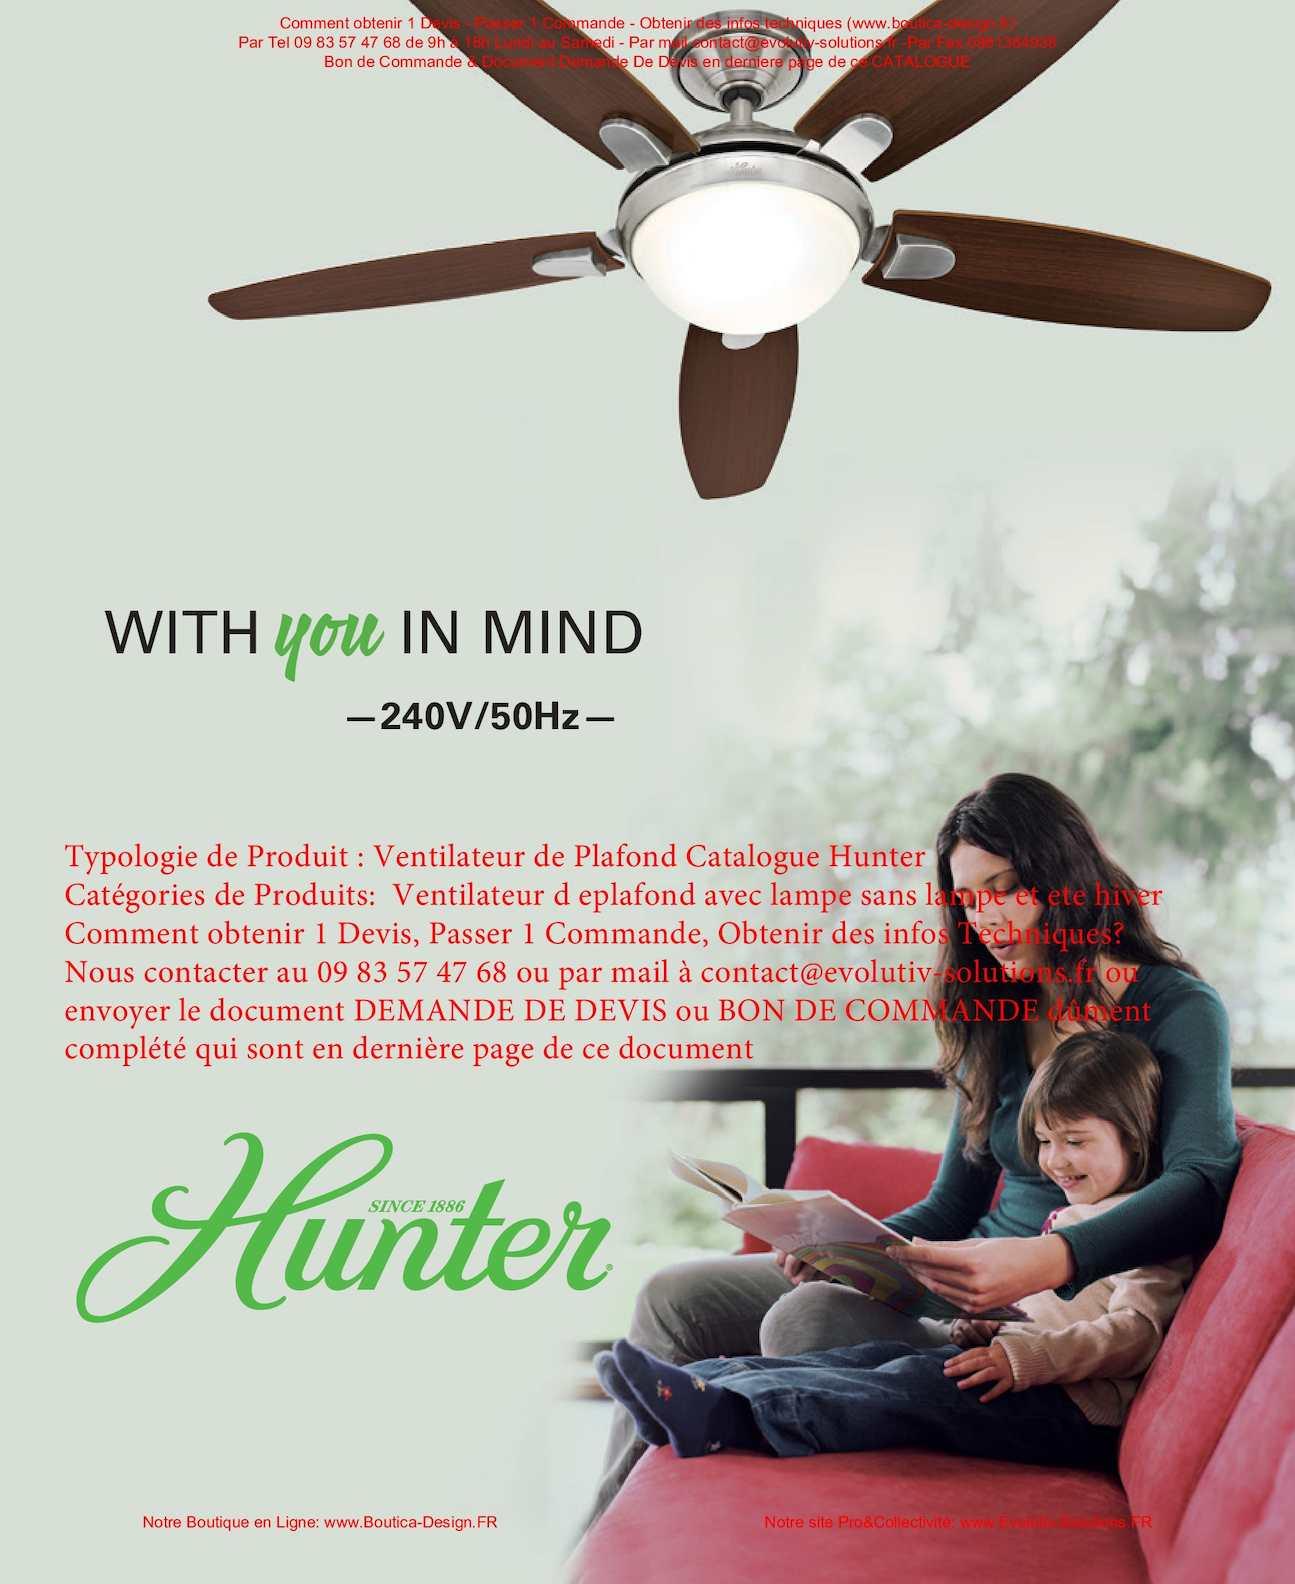 calam o hunter ventilateur de plafond catalogue 2016. Black Bedroom Furniture Sets. Home Design Ideas